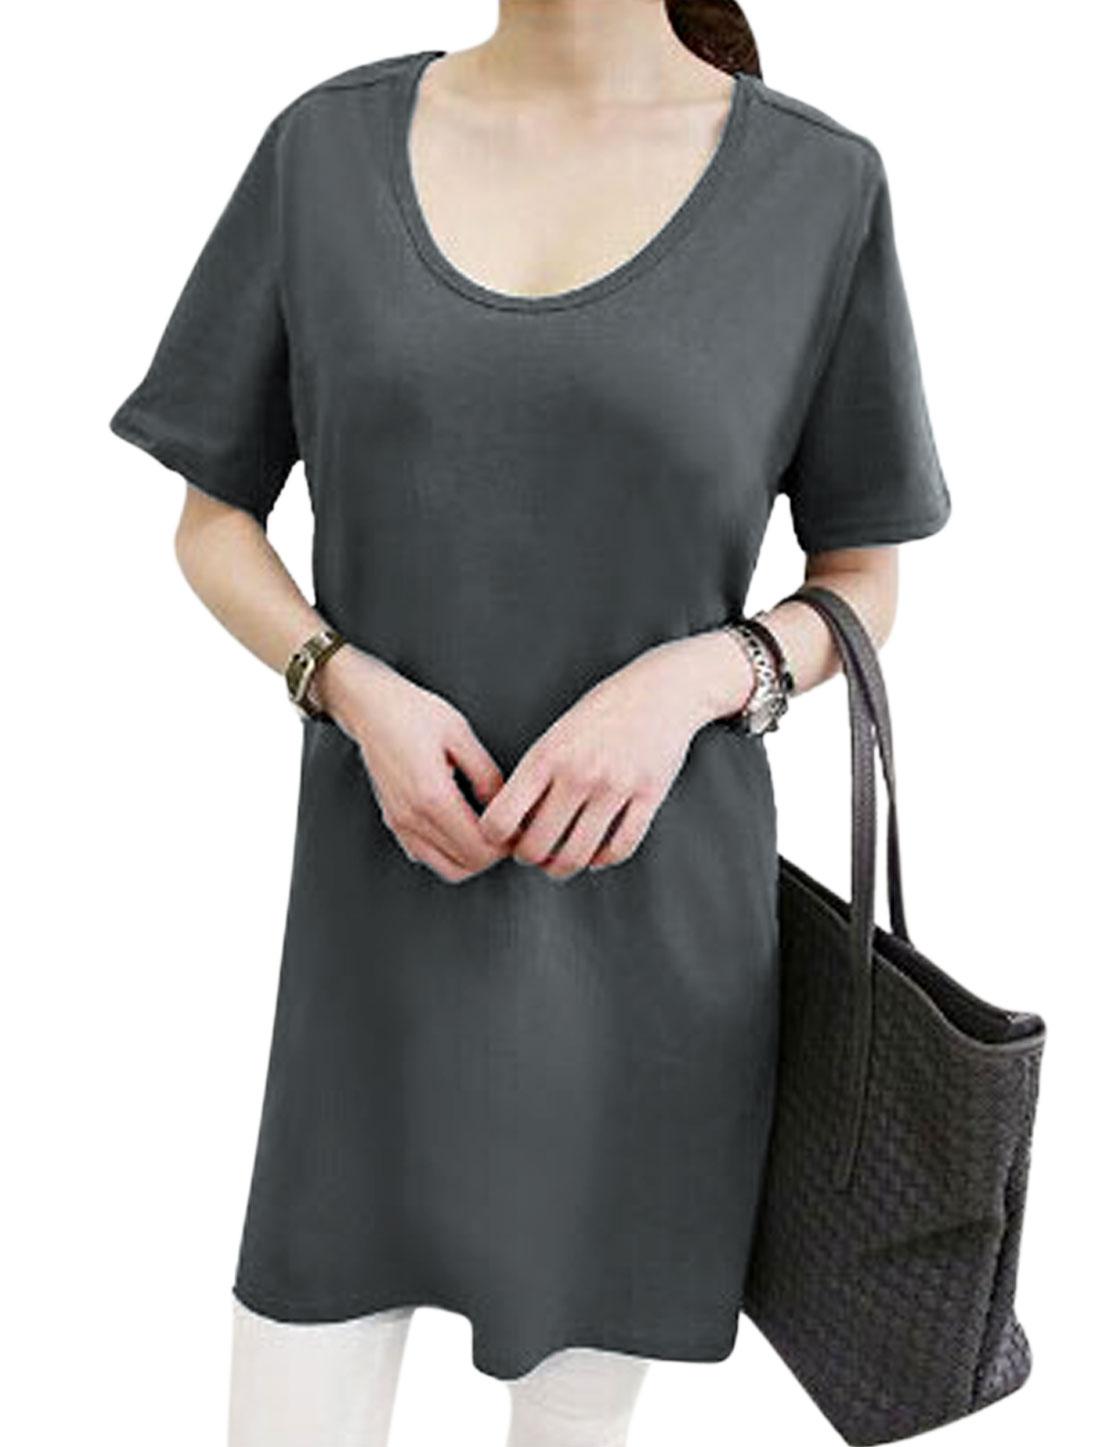 Women Short Sleeve Scoop Neck Longline Tunic T-Shirt Dark Gray XS